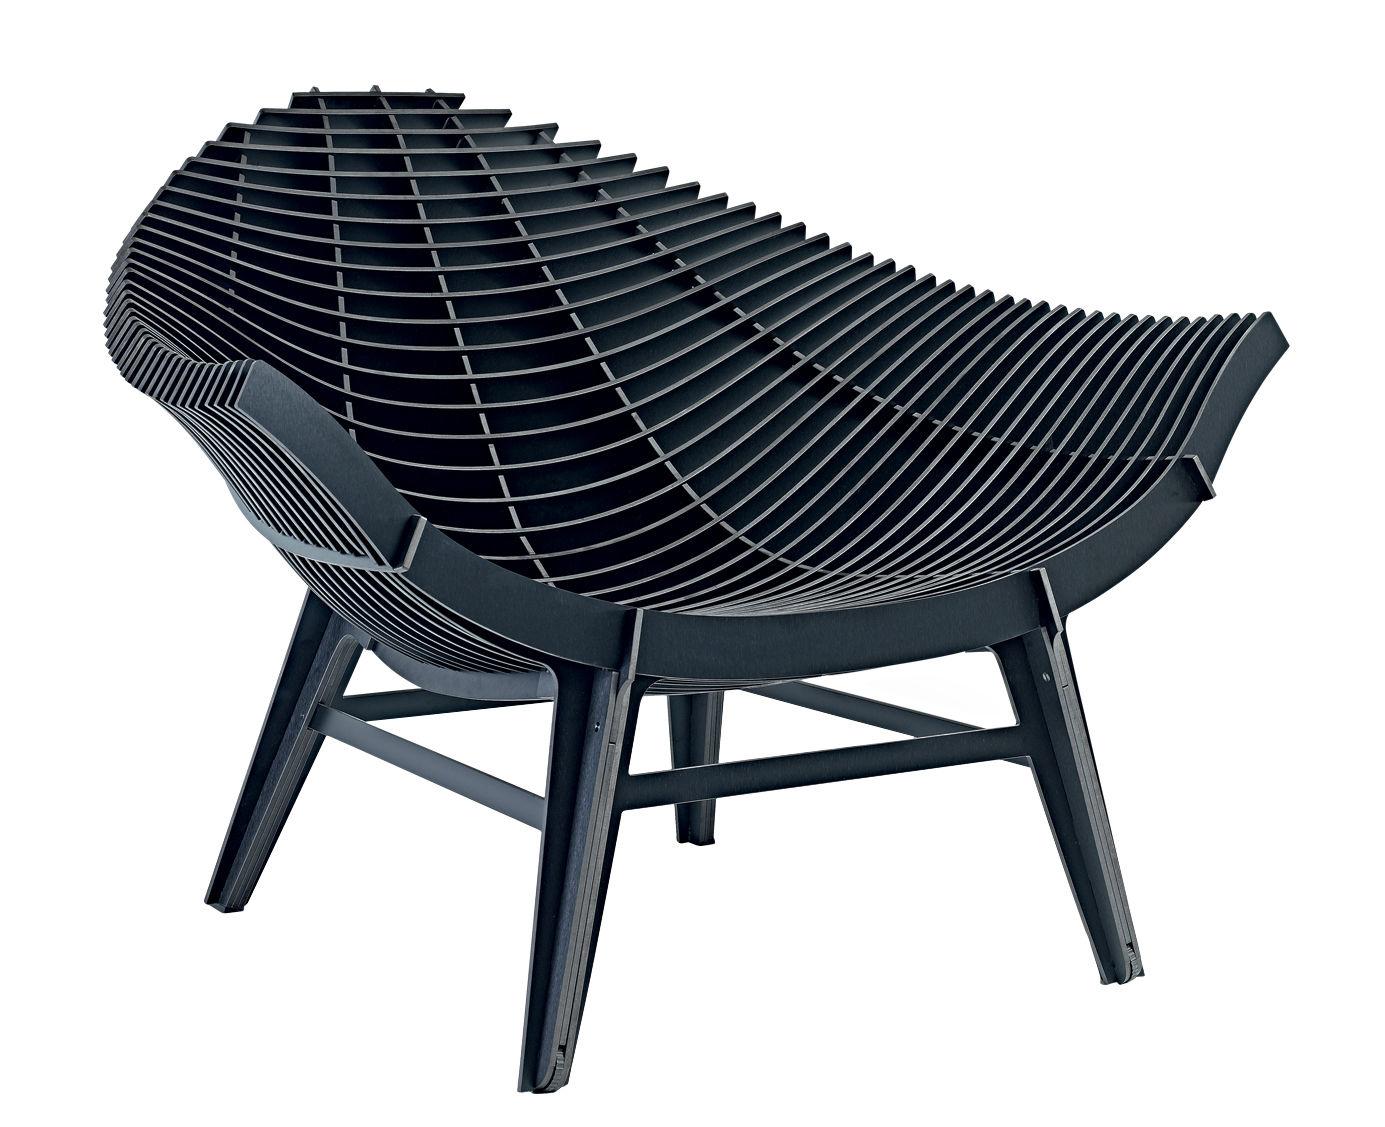 manta kompaktlaminat f r haus und garten ibride lounge sessel. Black Bedroom Furniture Sets. Home Design Ideas